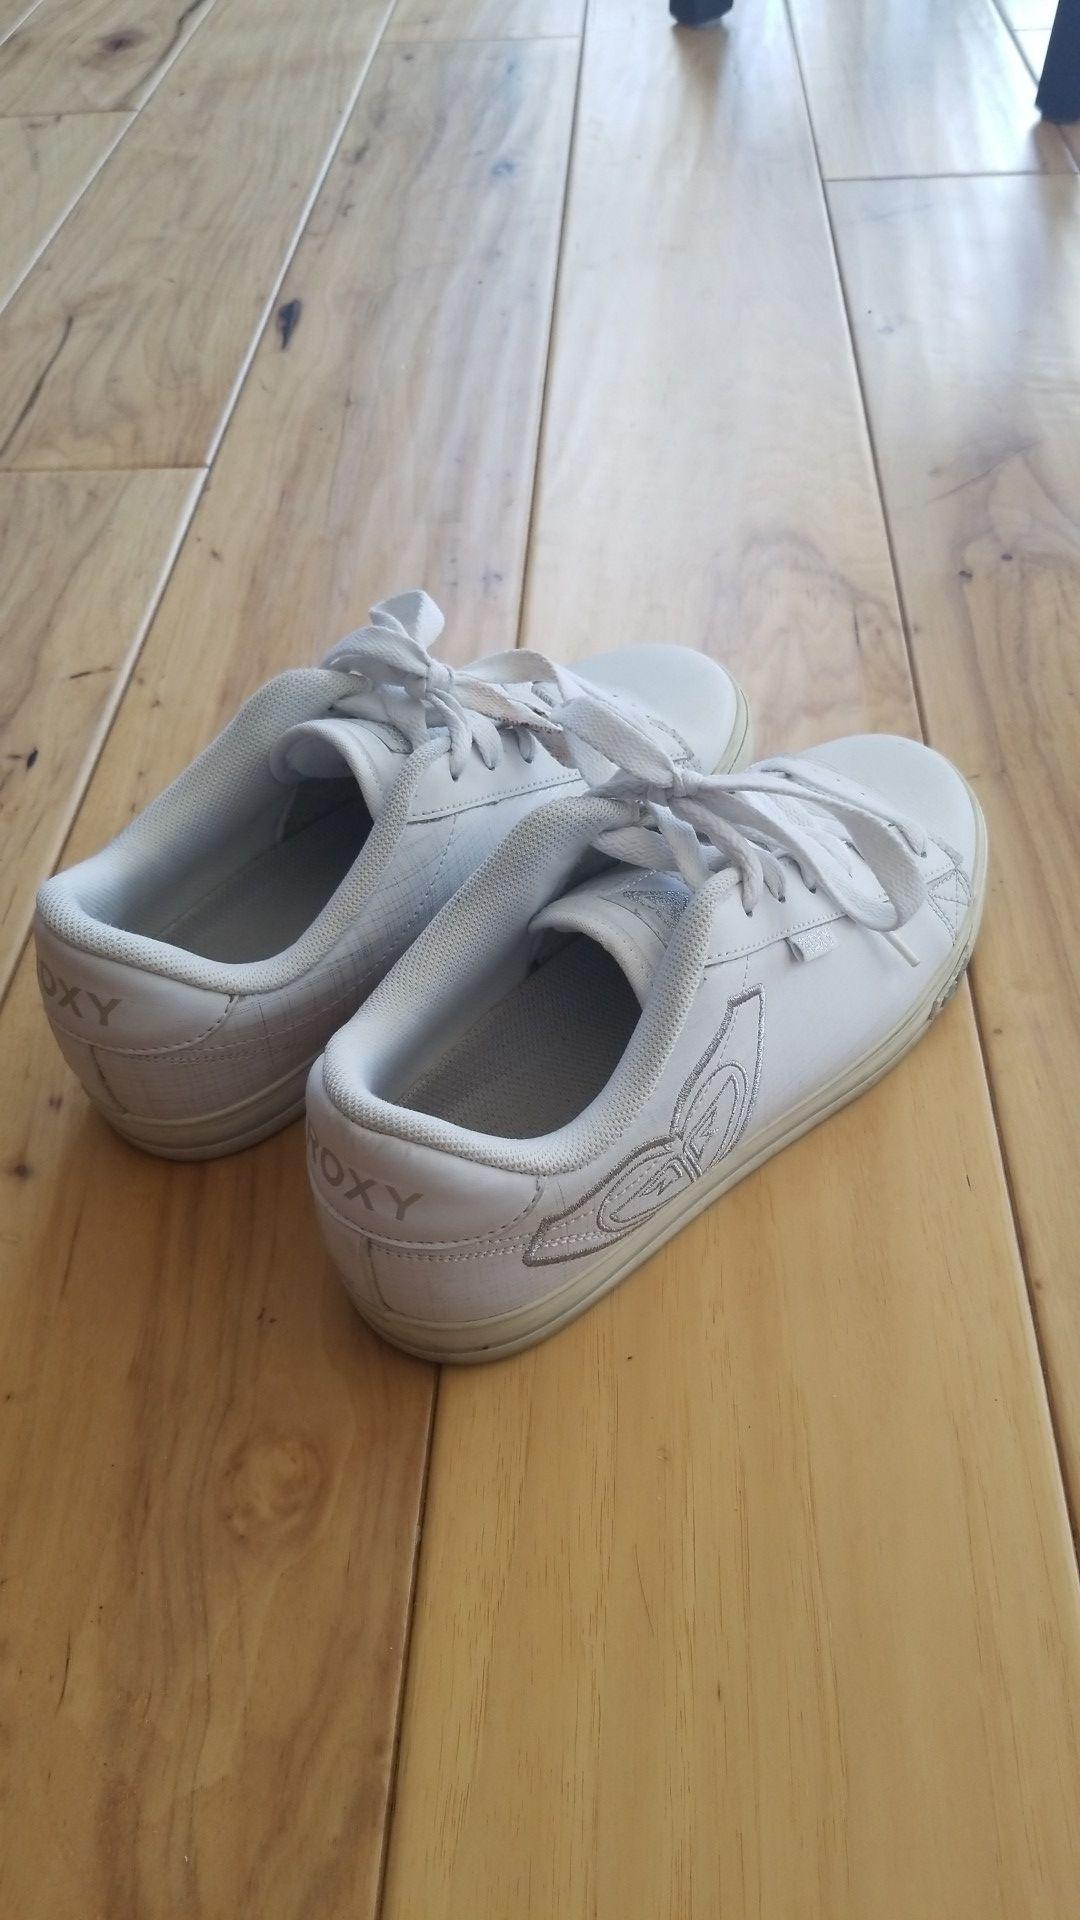 White Roxy sneakers, size 6